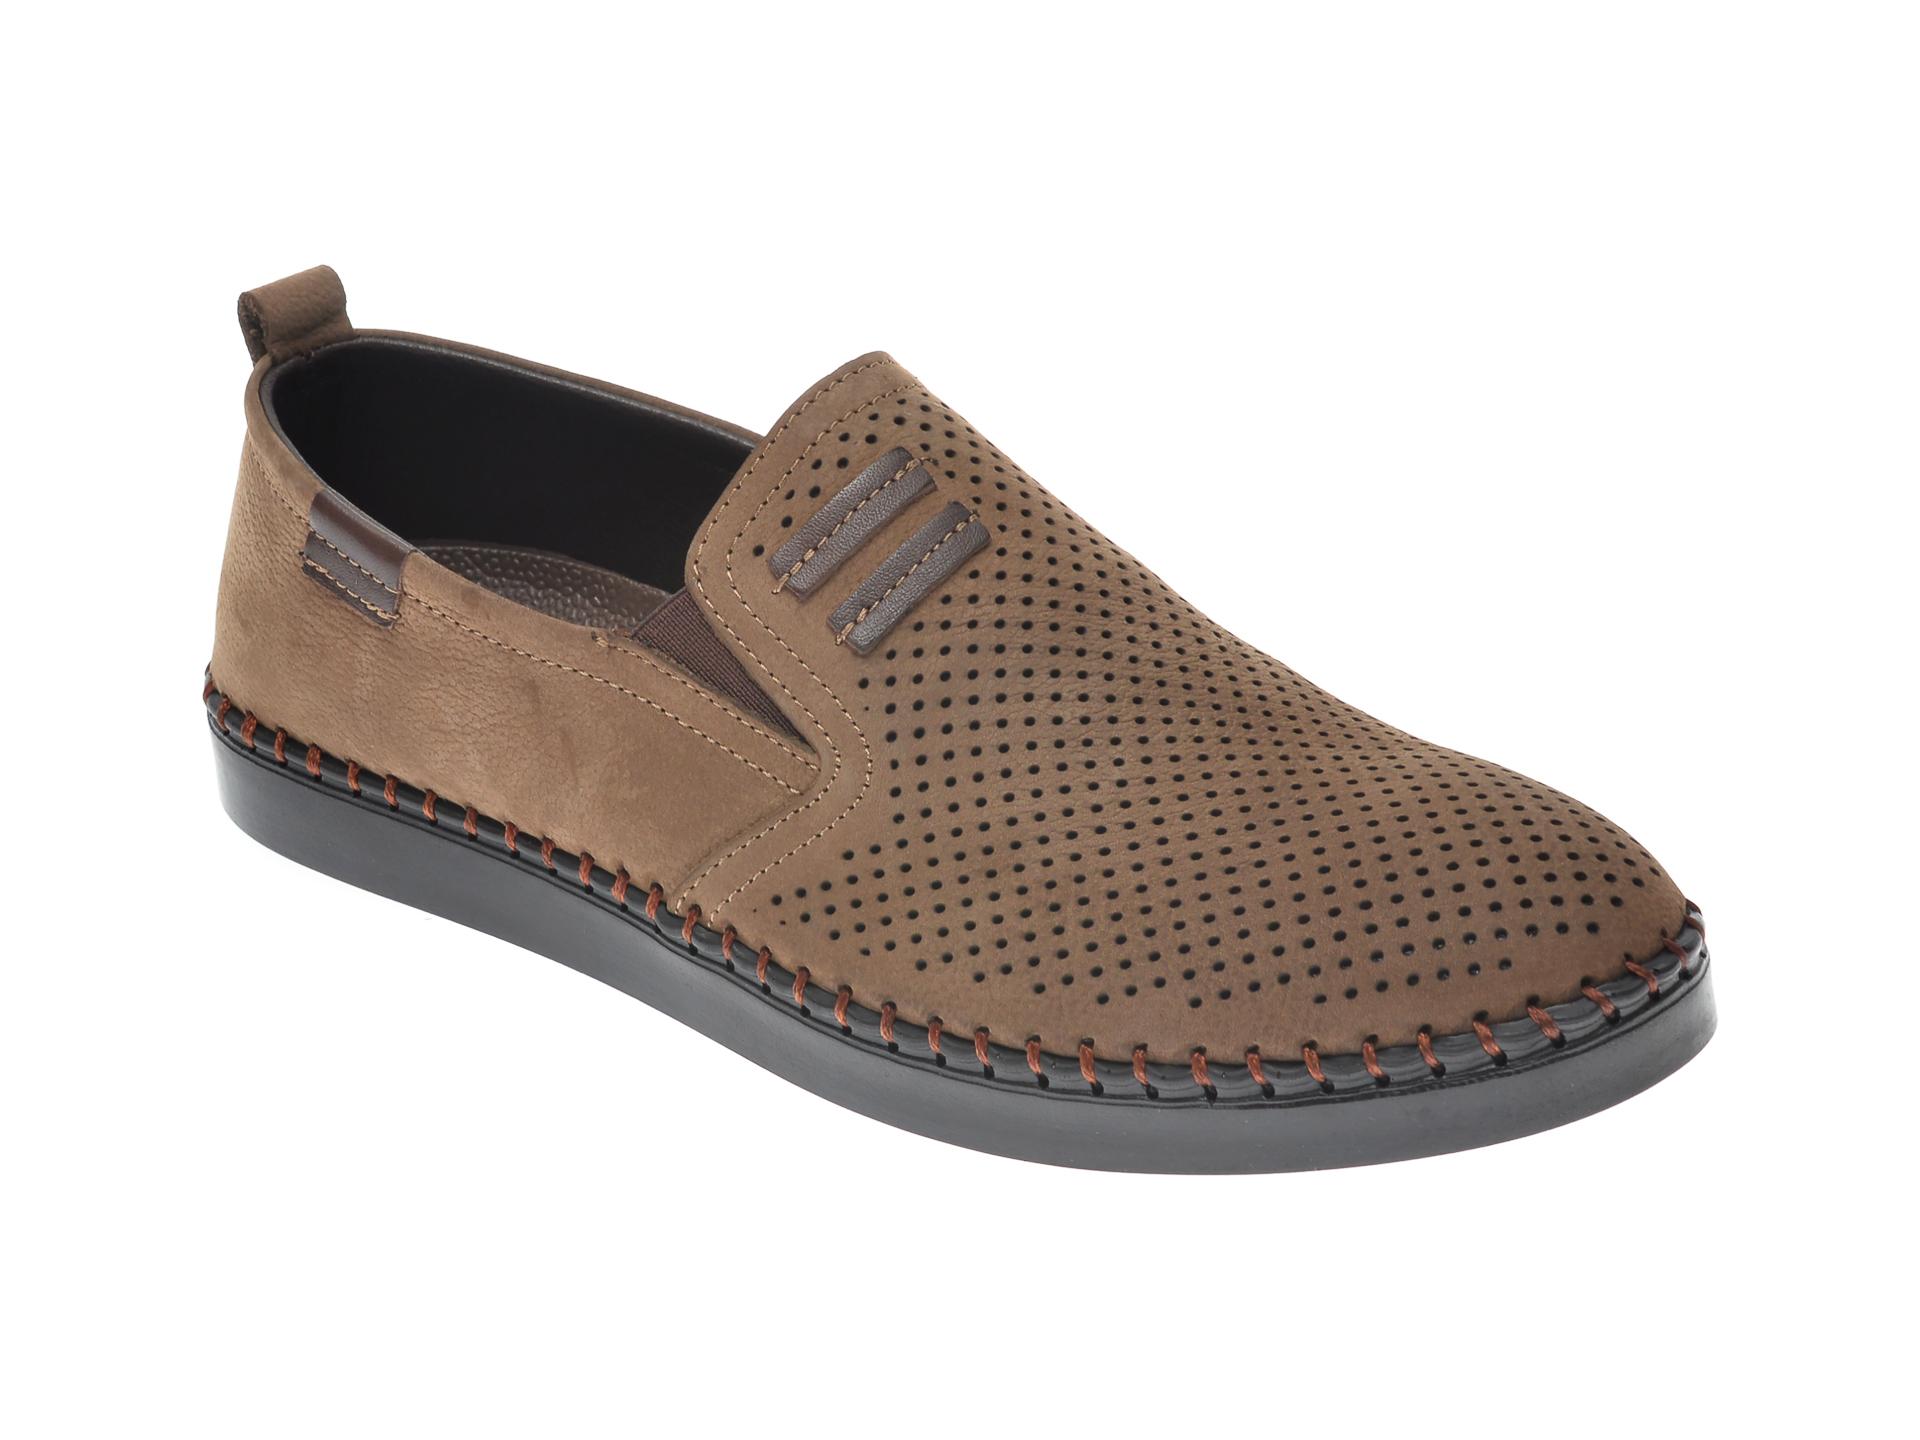 Pantofi OTTER gri, 2870, din nabuc imagine